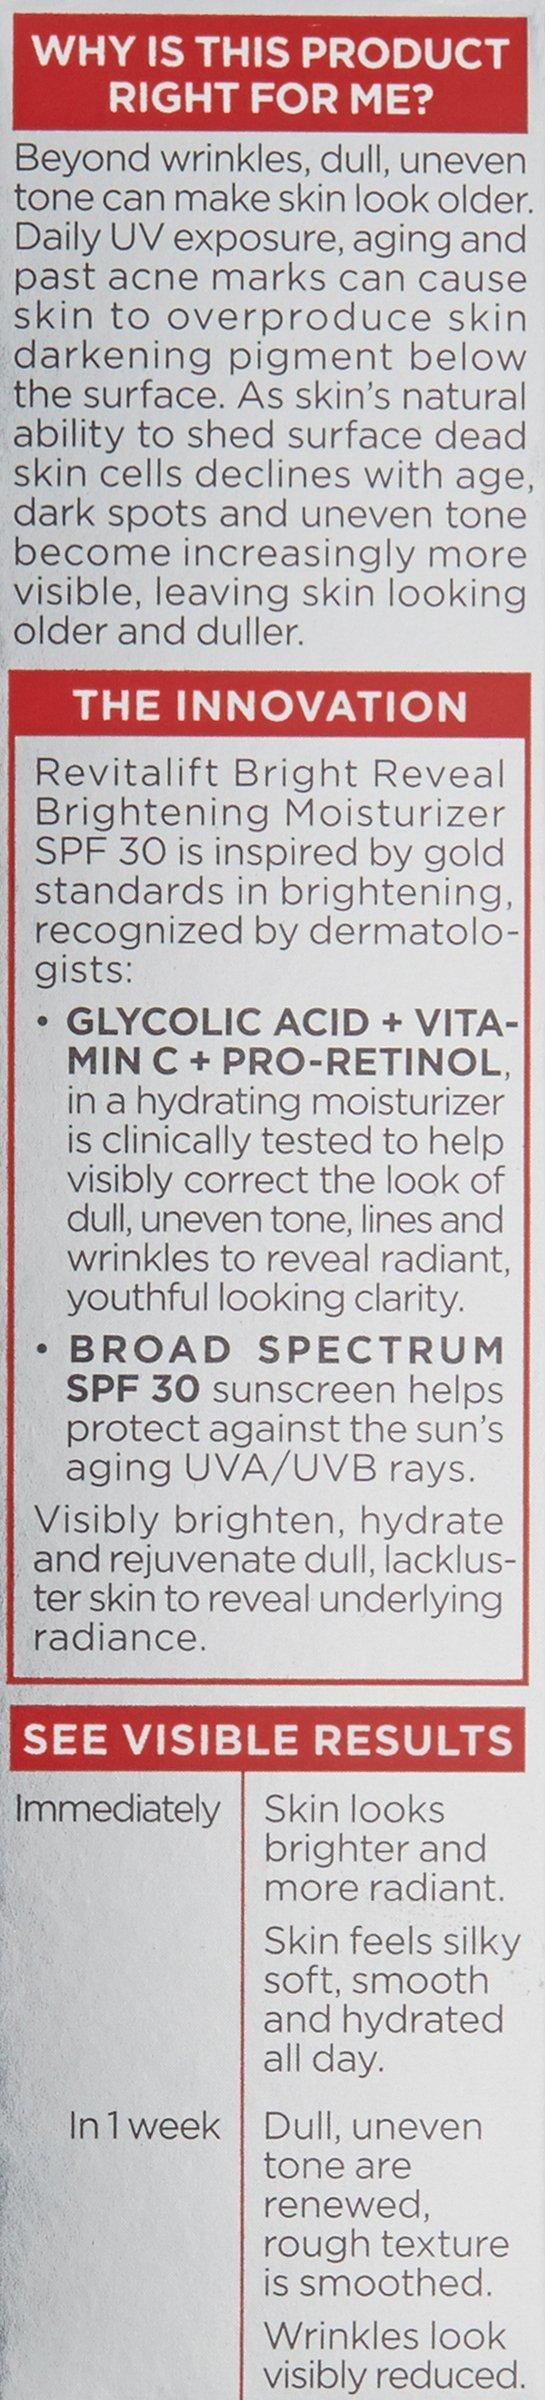 L'Oréal Paris Skincare Revitalift Bright Reveal Face Moisturizer with SPF 30, Glycolic Acid, Vitamin C and Pro-Retinol, 1 fl. oz. by L'Oreal Paris (Image #4)